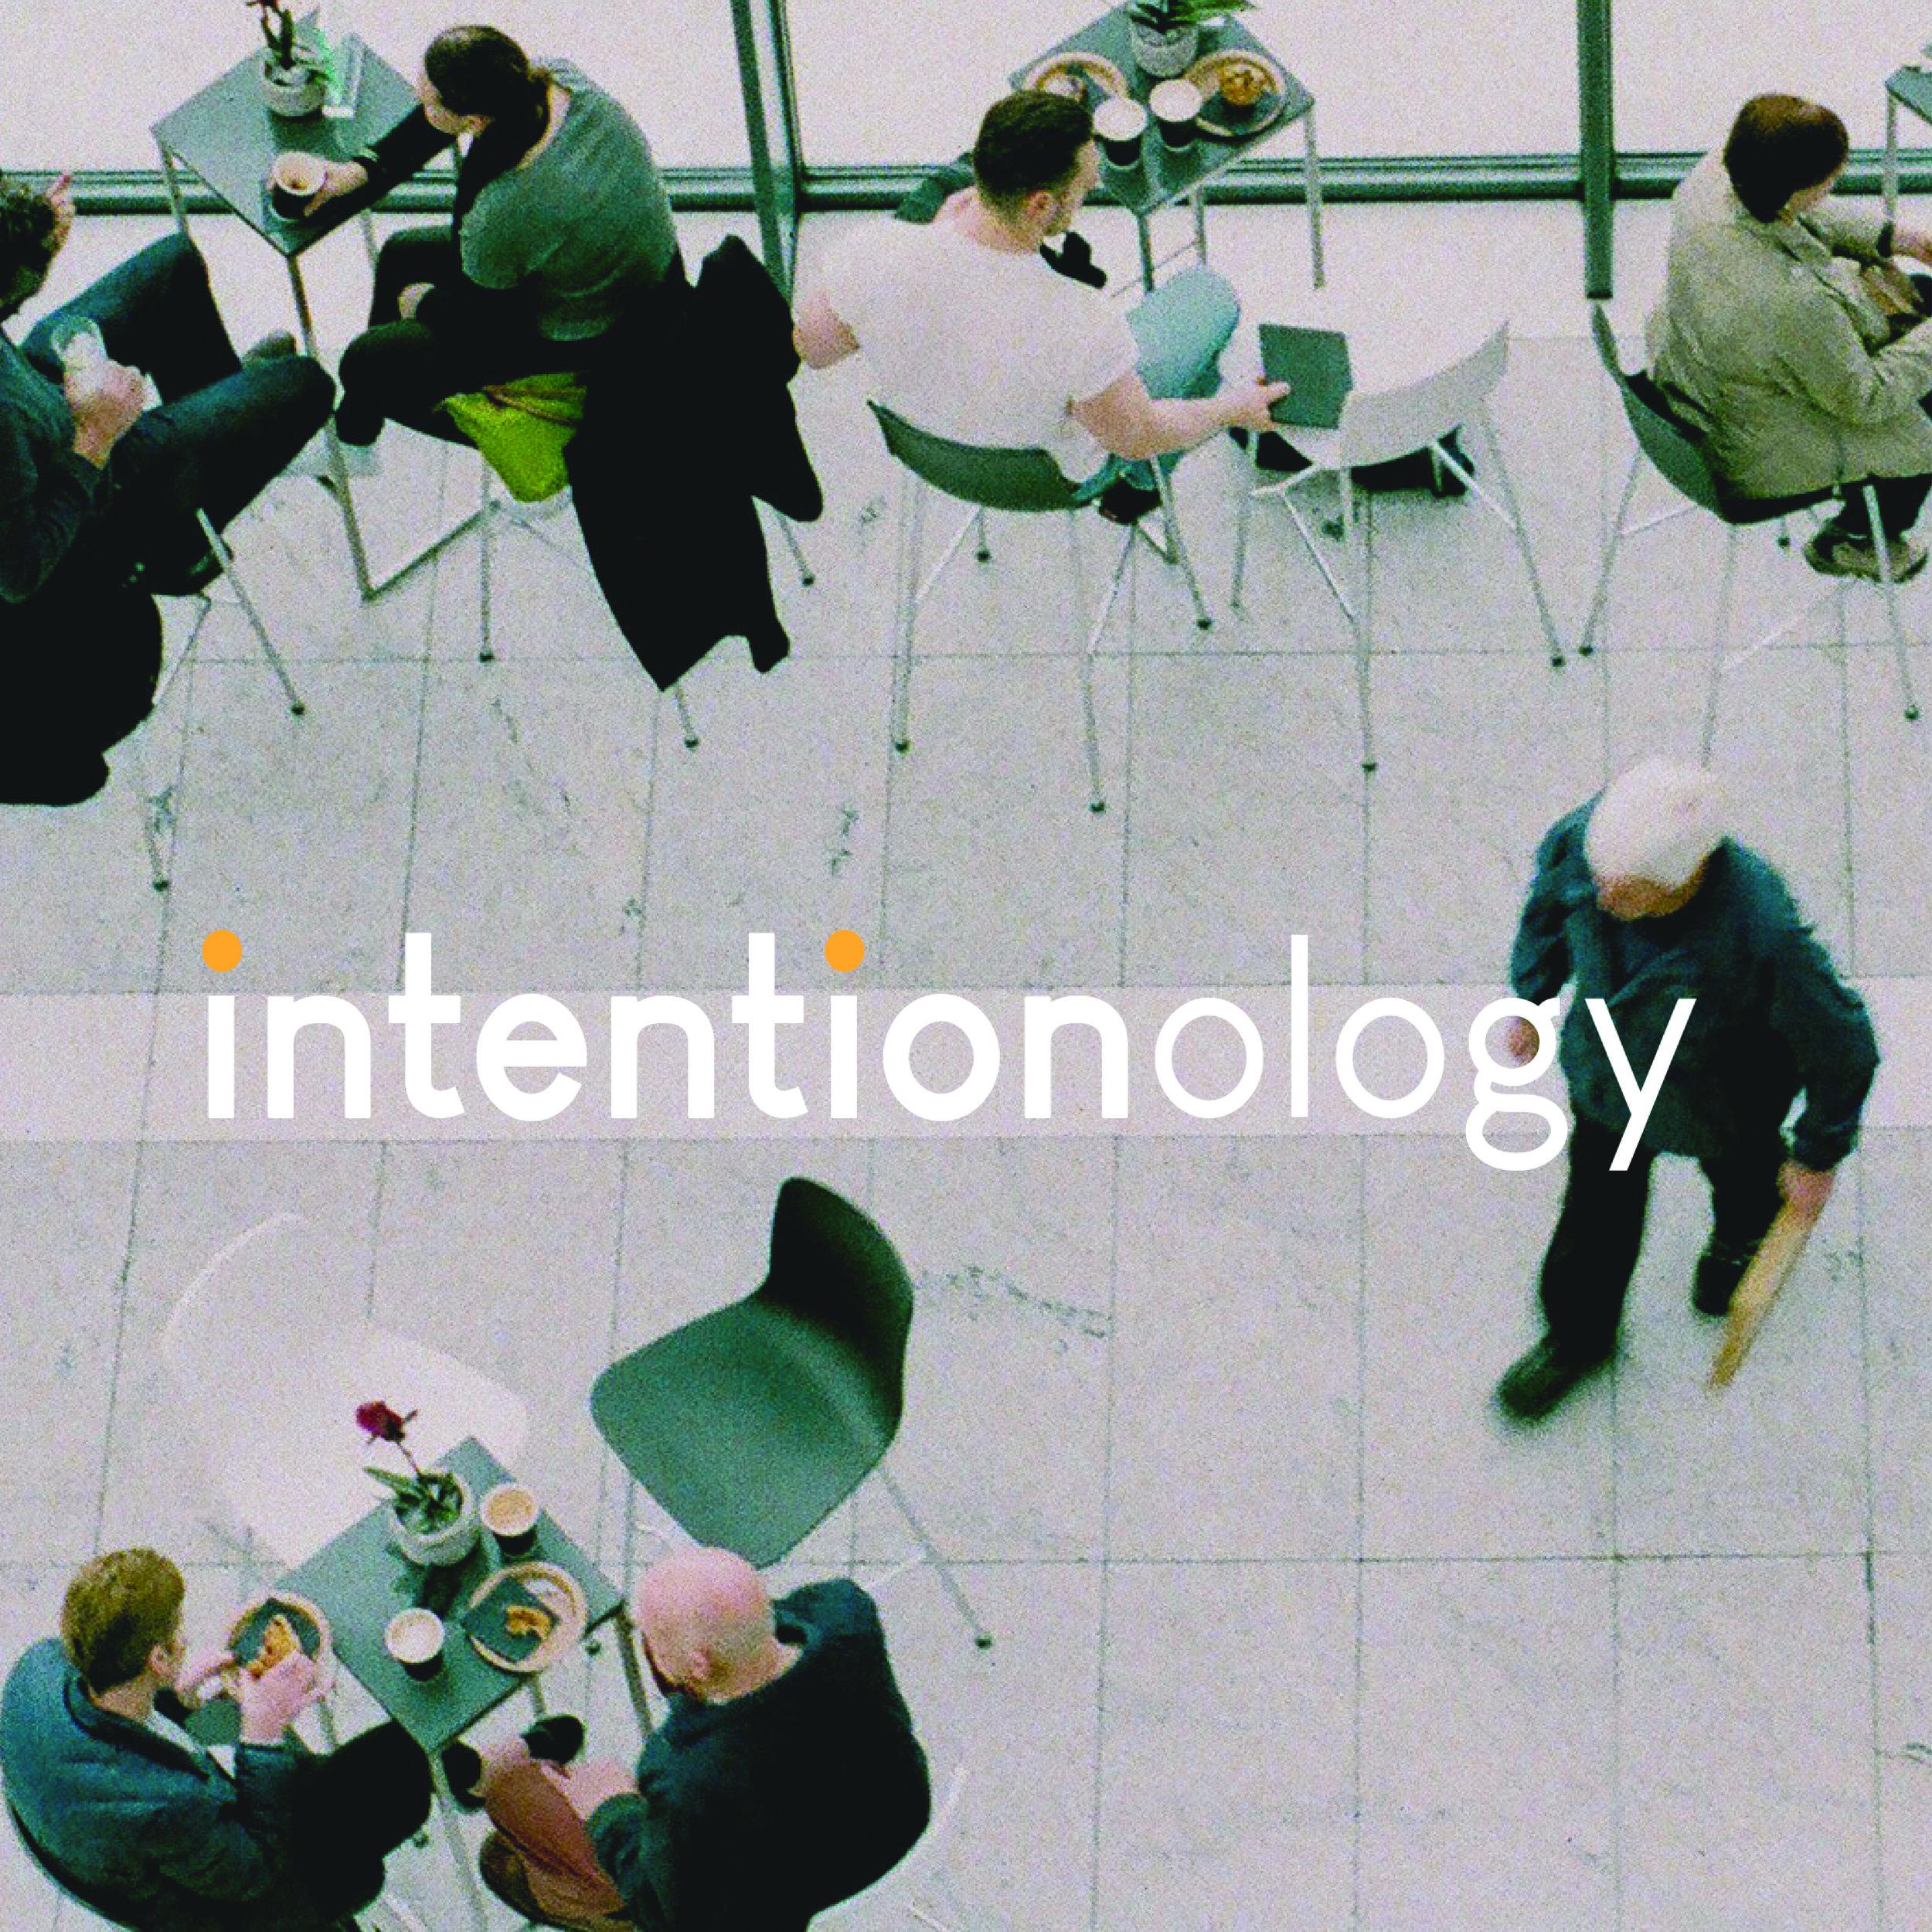 Intentionology-Brand4.jpg